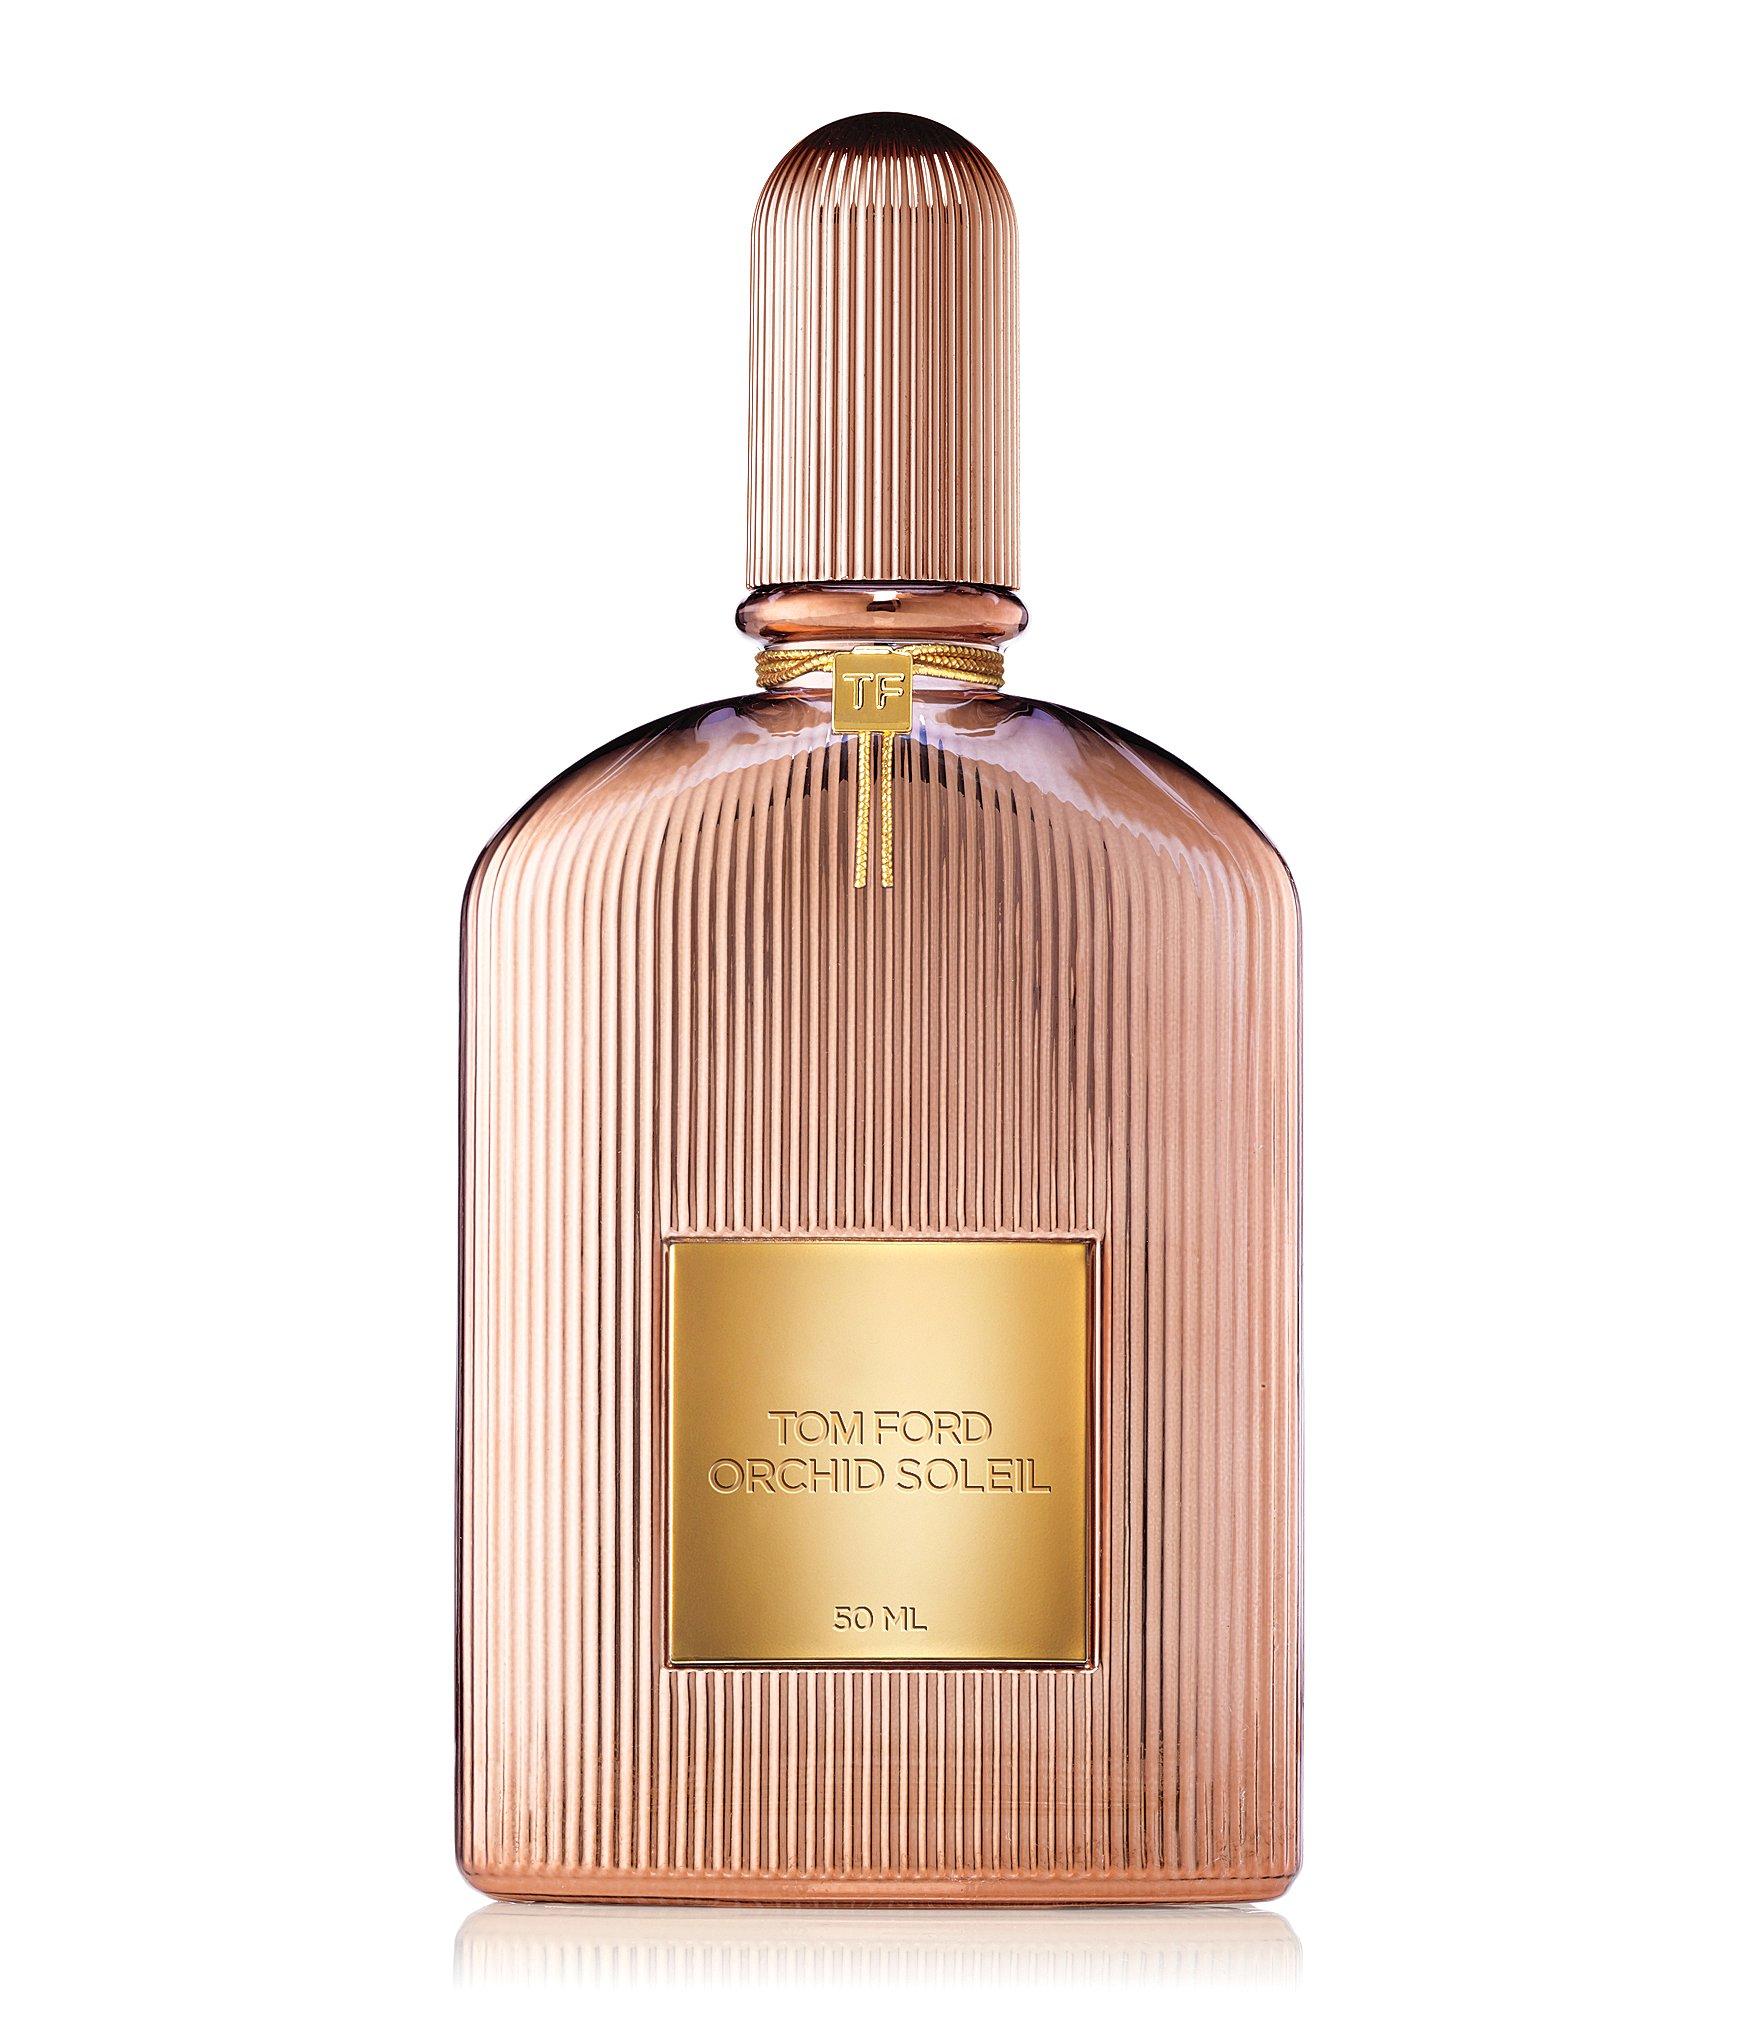 tom ford orchid soleil eau de parfum dillards. Black Bedroom Furniture Sets. Home Design Ideas